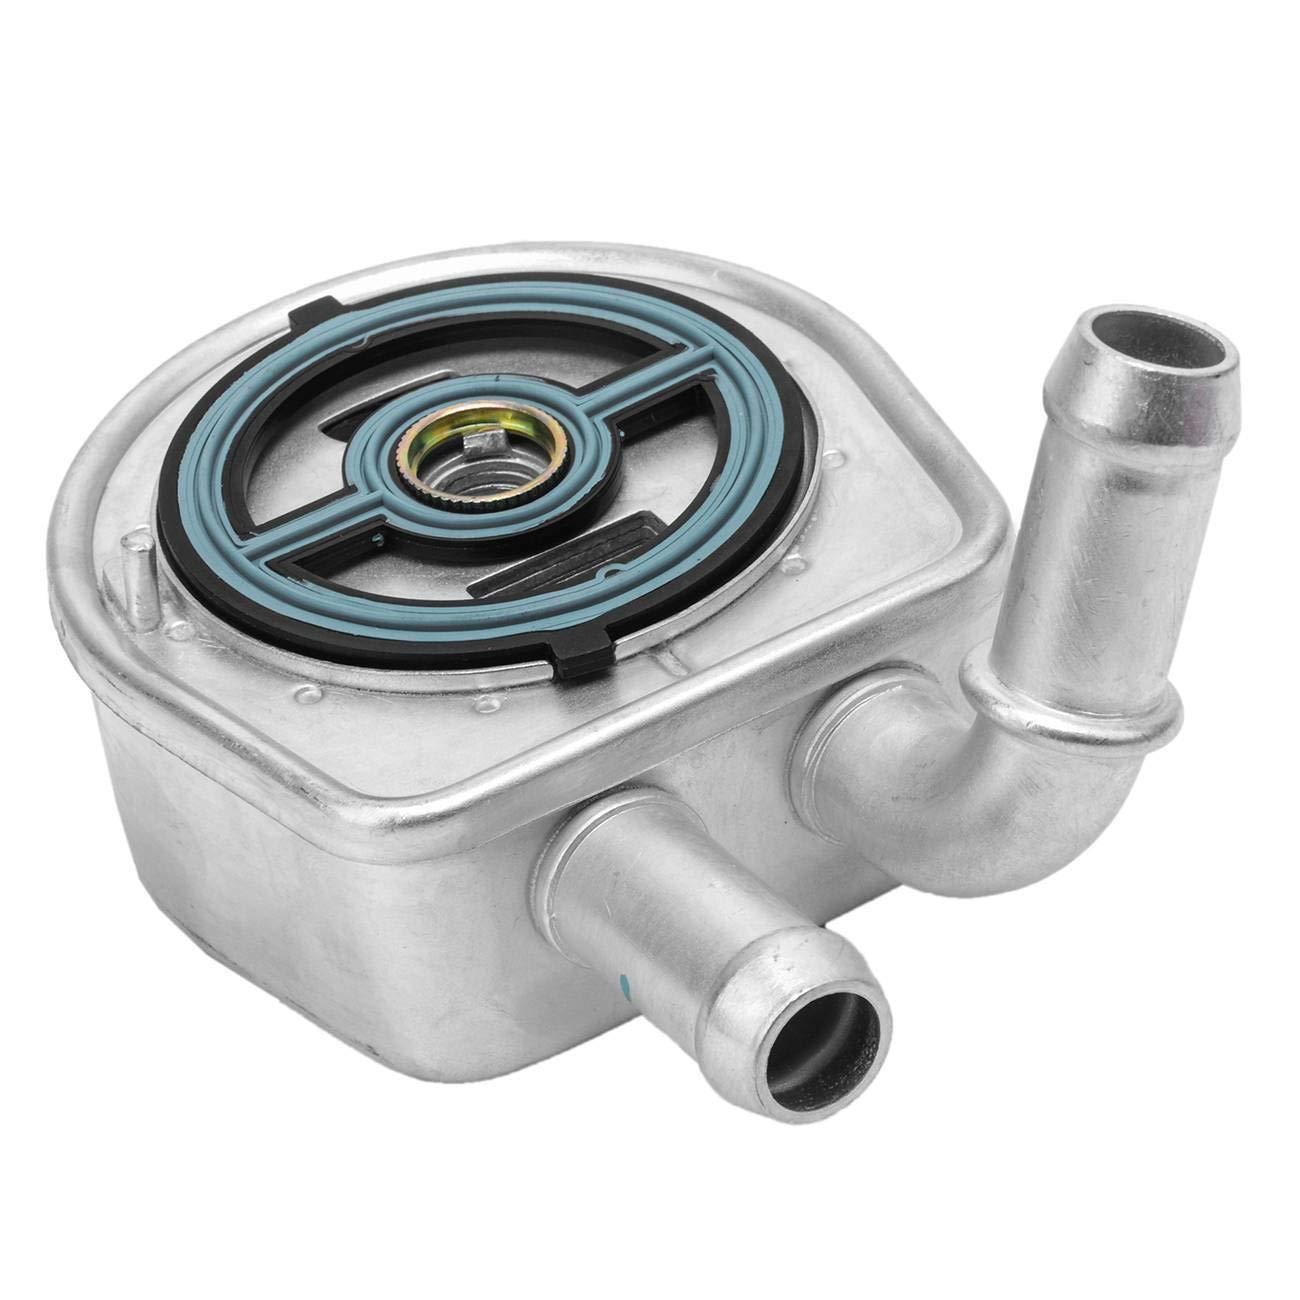 Gasket for Mazda 3 5 6 CX-7 Mazdaspeed Grand Touring Sport 2.3L 2.5L OKAY MOTOR Engine Oil Cooler